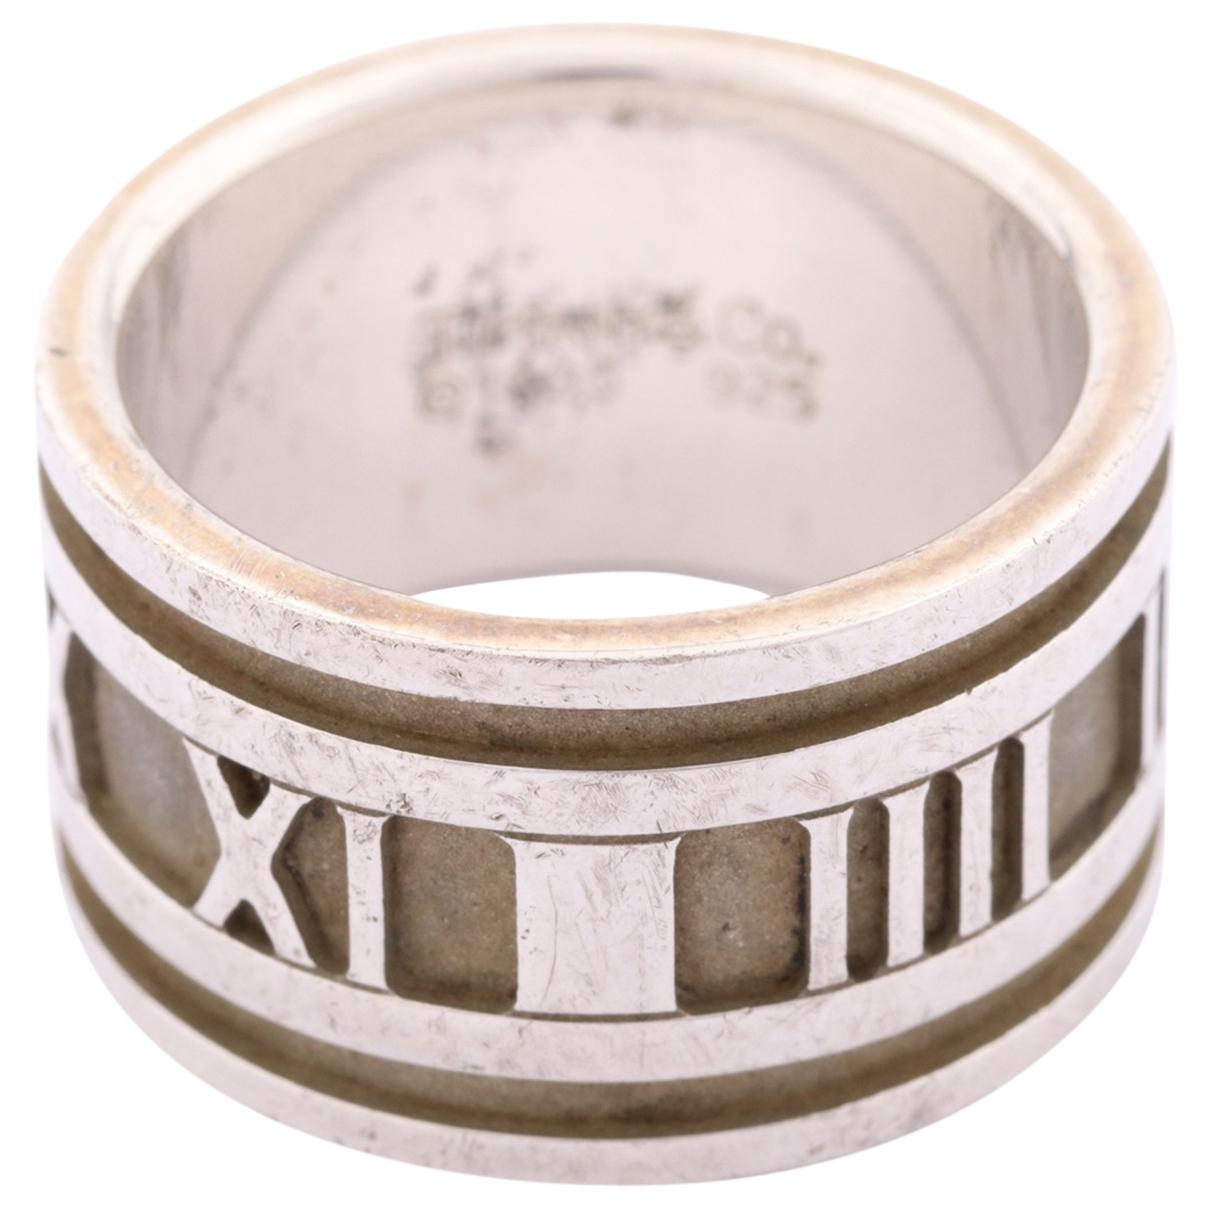 Tiffany & Co Atlas Ring in Silber